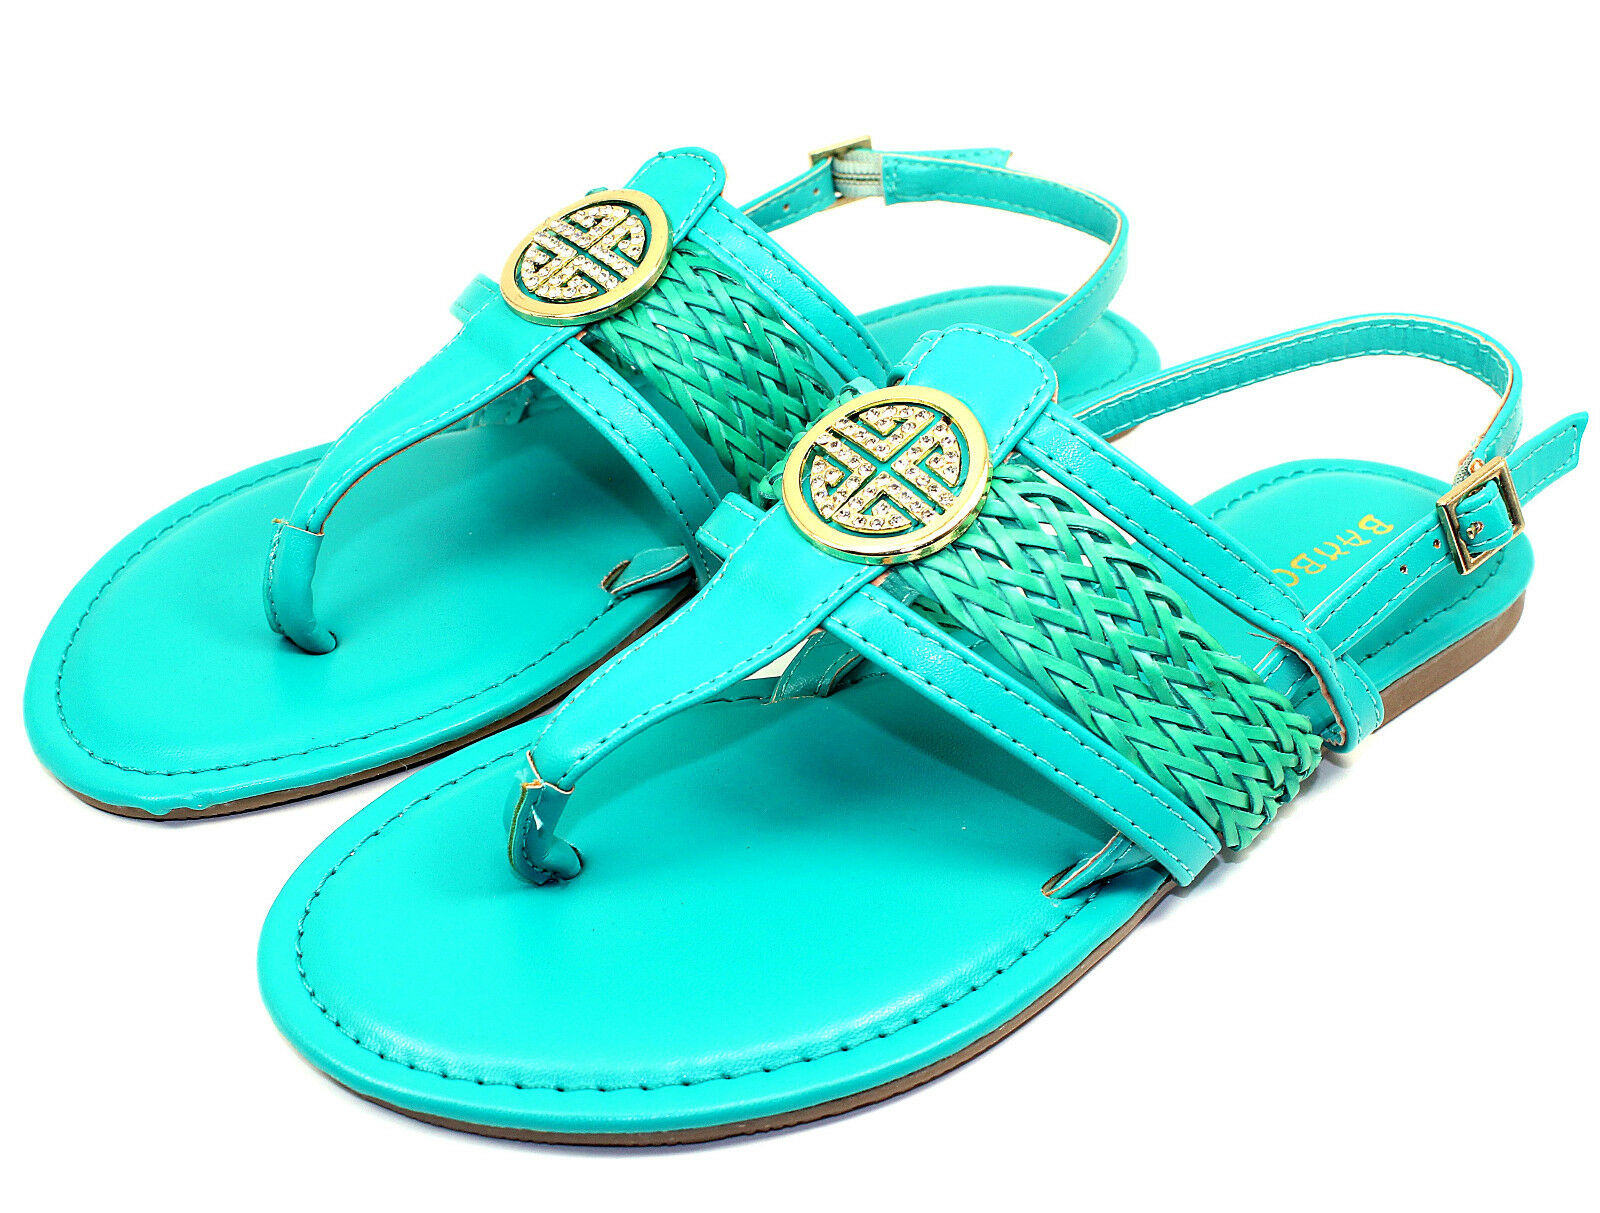 Nadya-15 Sandals Gladiator Buckles Flats Strappy Sandals Nadya-15 Women Shoes Sea Green 5.5 60d962